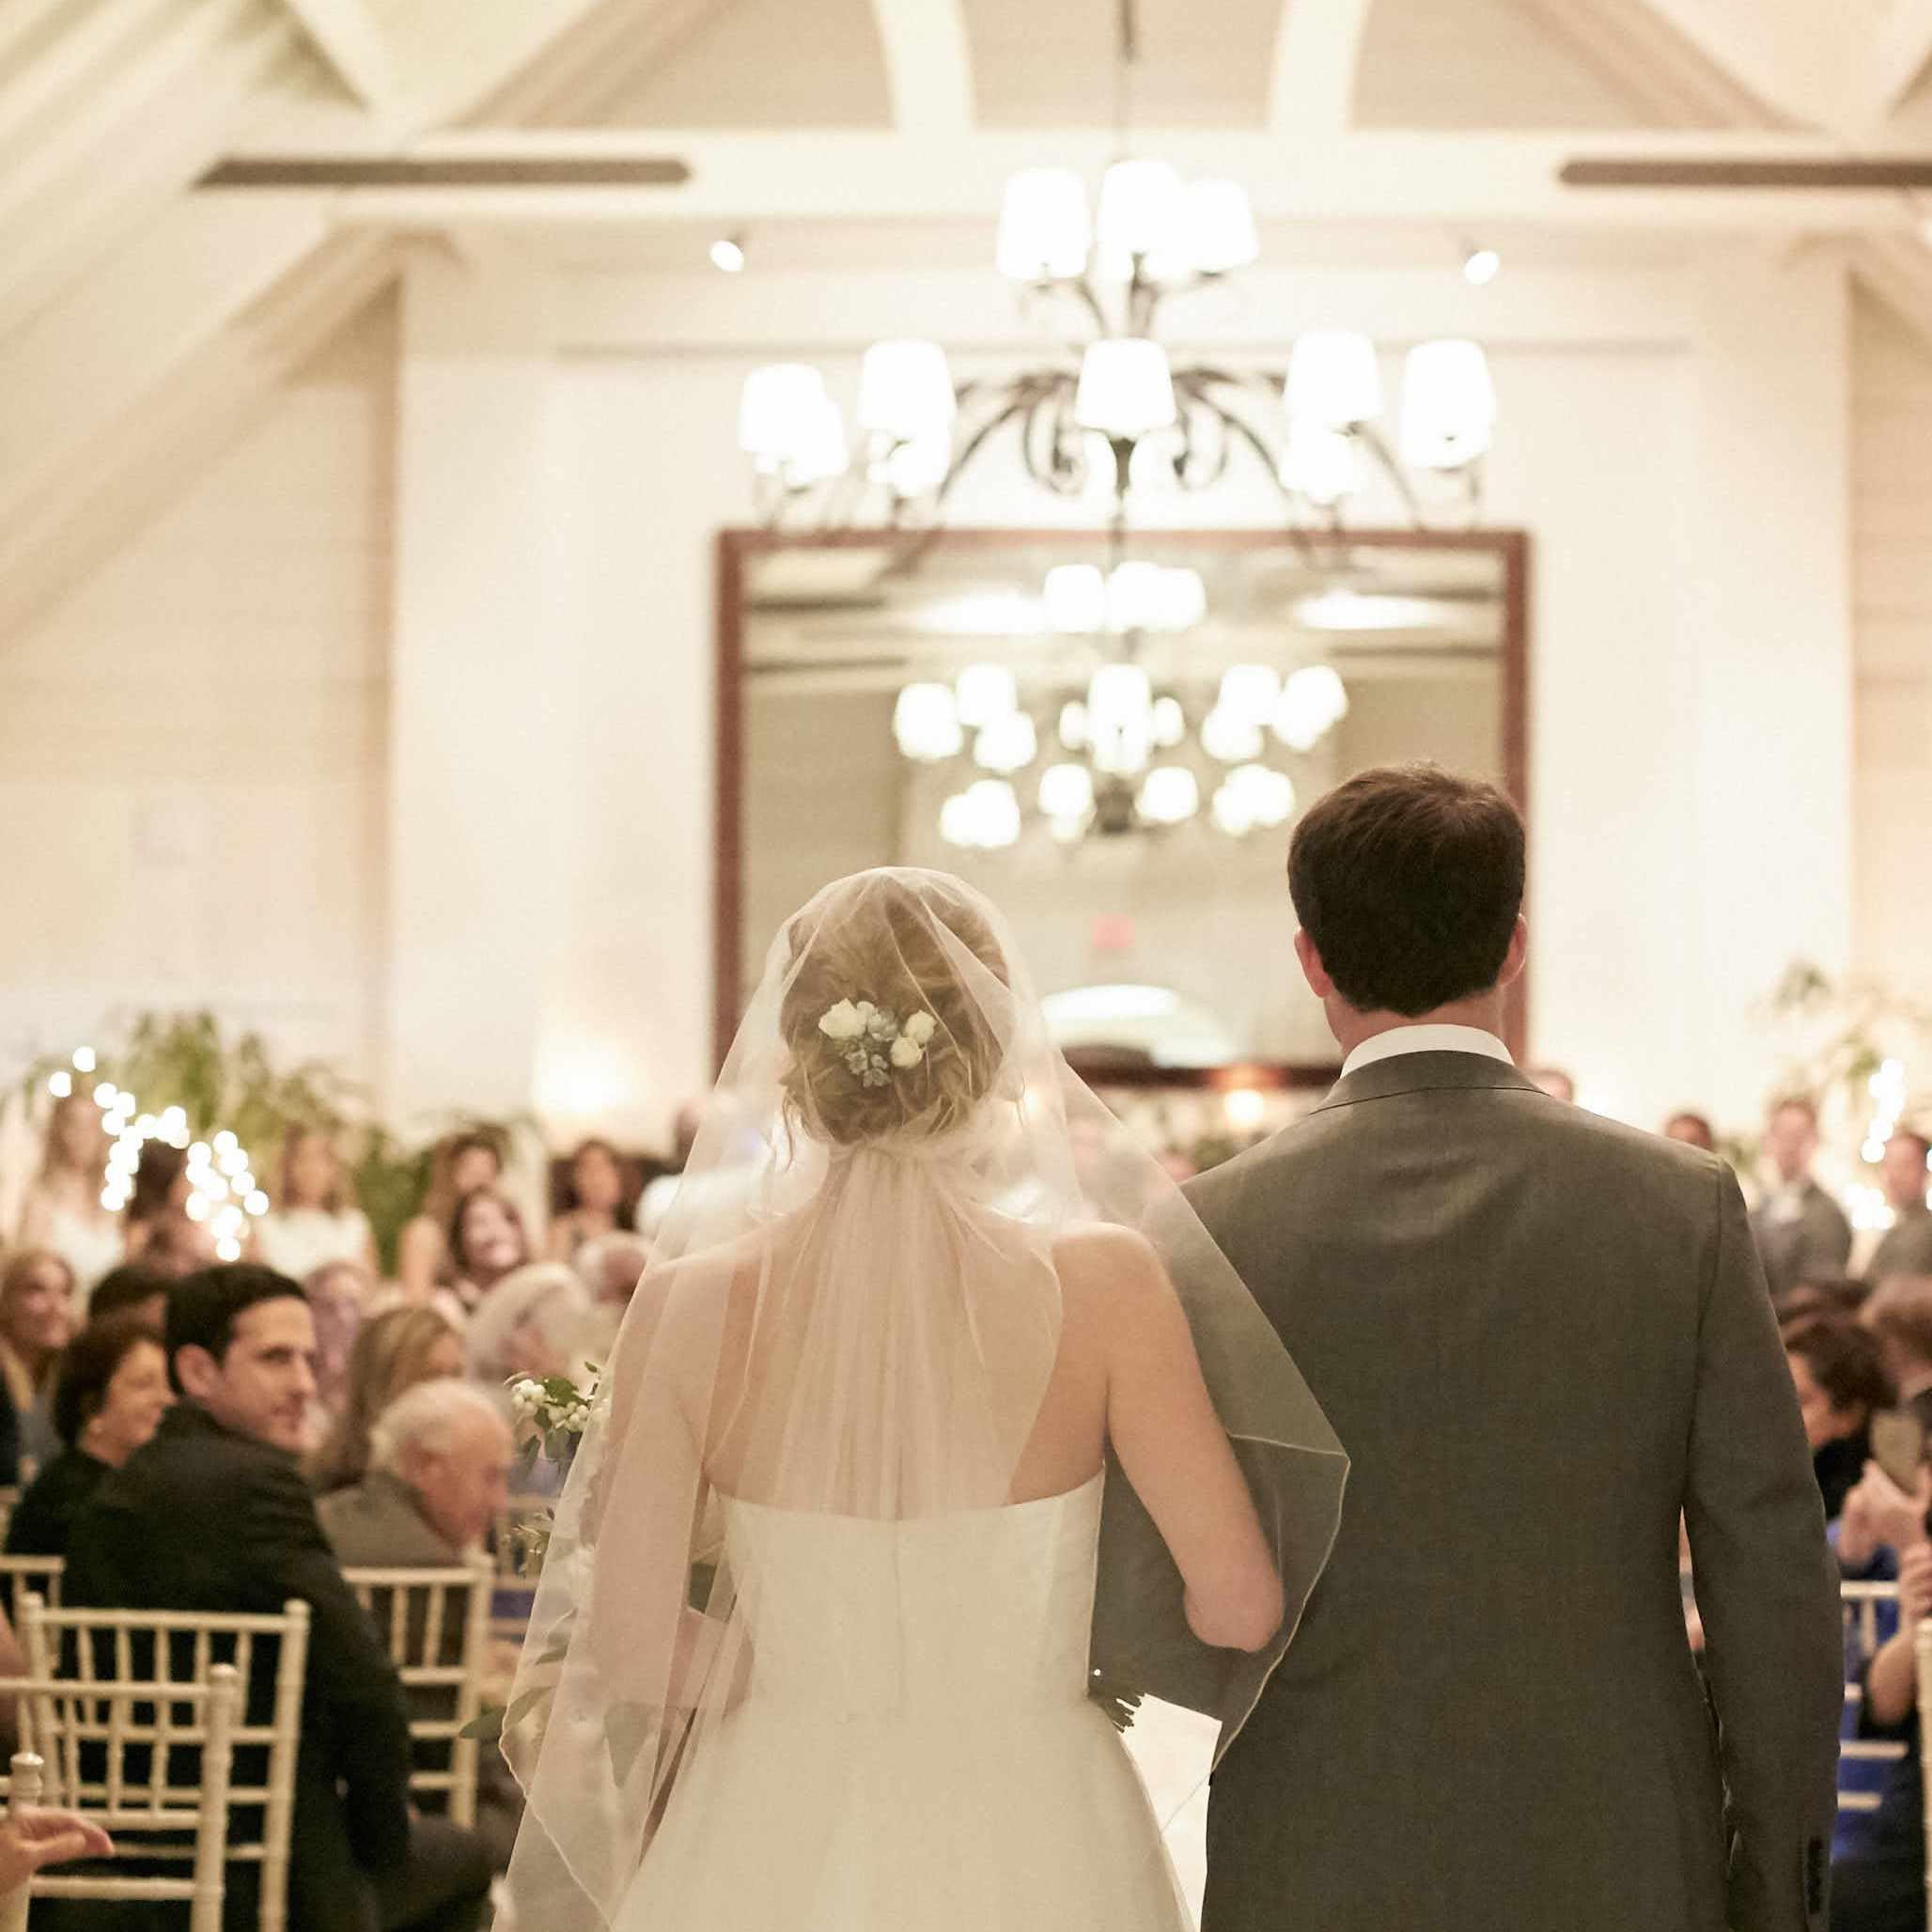 <p>Bride Walking Down the Aisle</p><br><br>